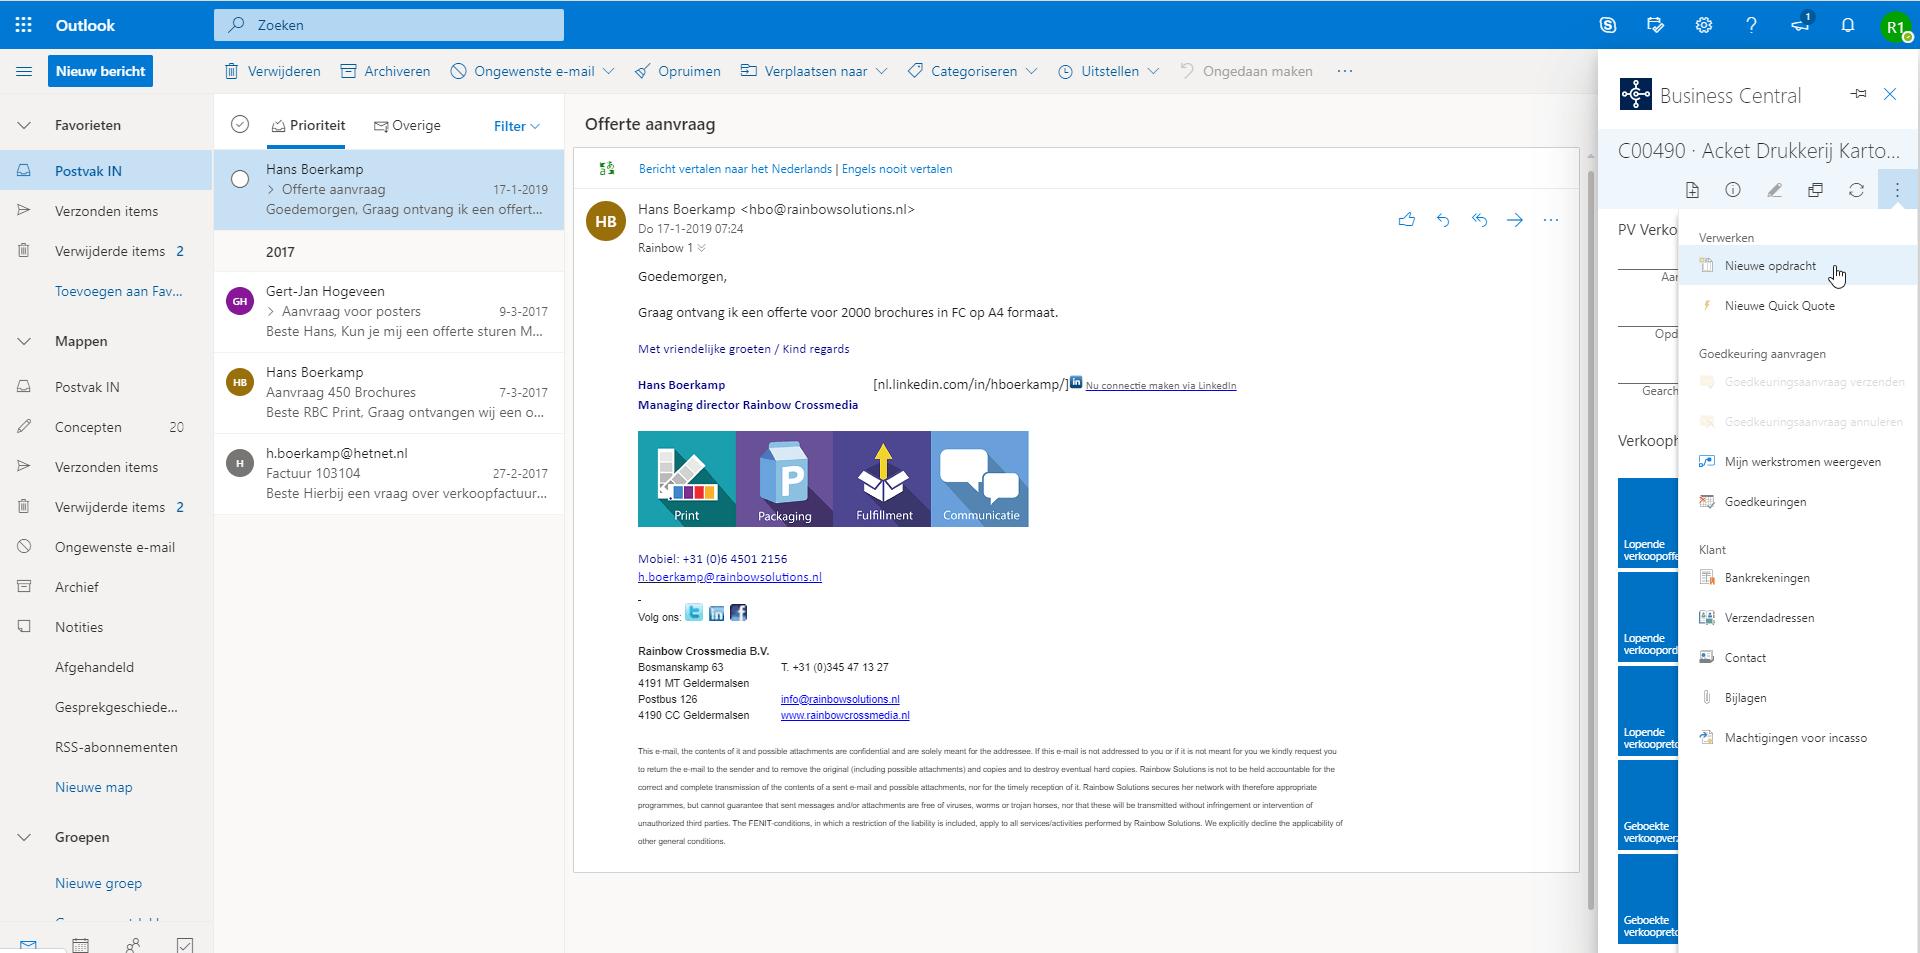 Outlook Business Inbox 2 - Microsoft Dynamics 365